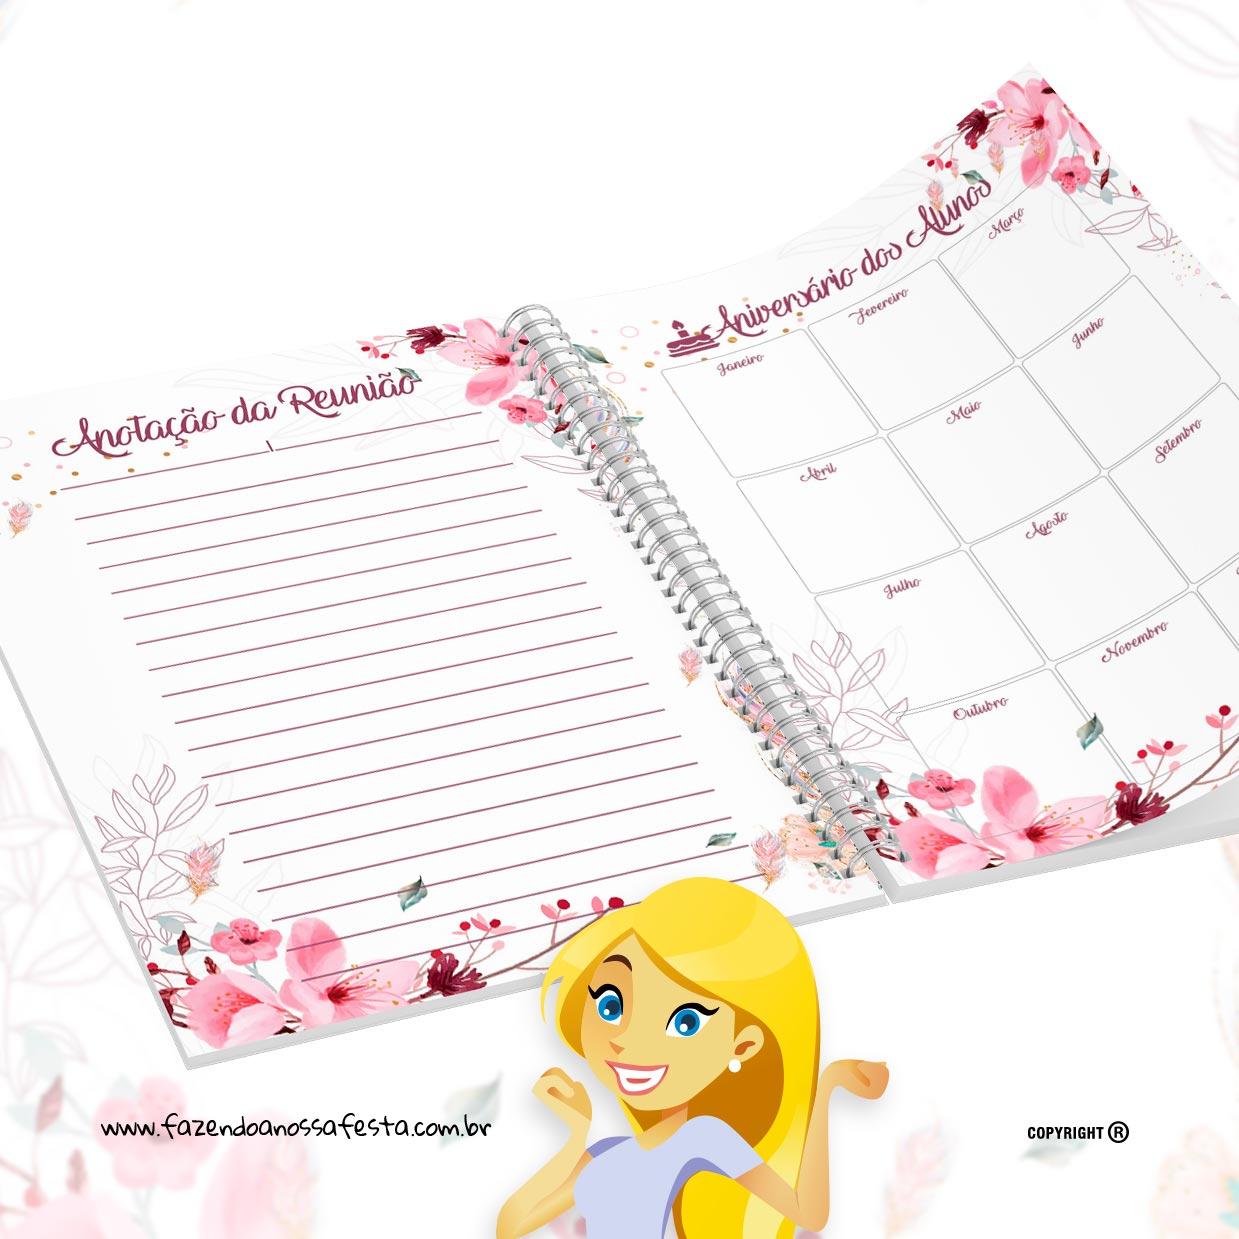 caderno plano de aula educacao infantil floral 2020 para imprimircaderno plano de aula educacao infantil floral 2020 para imprimir